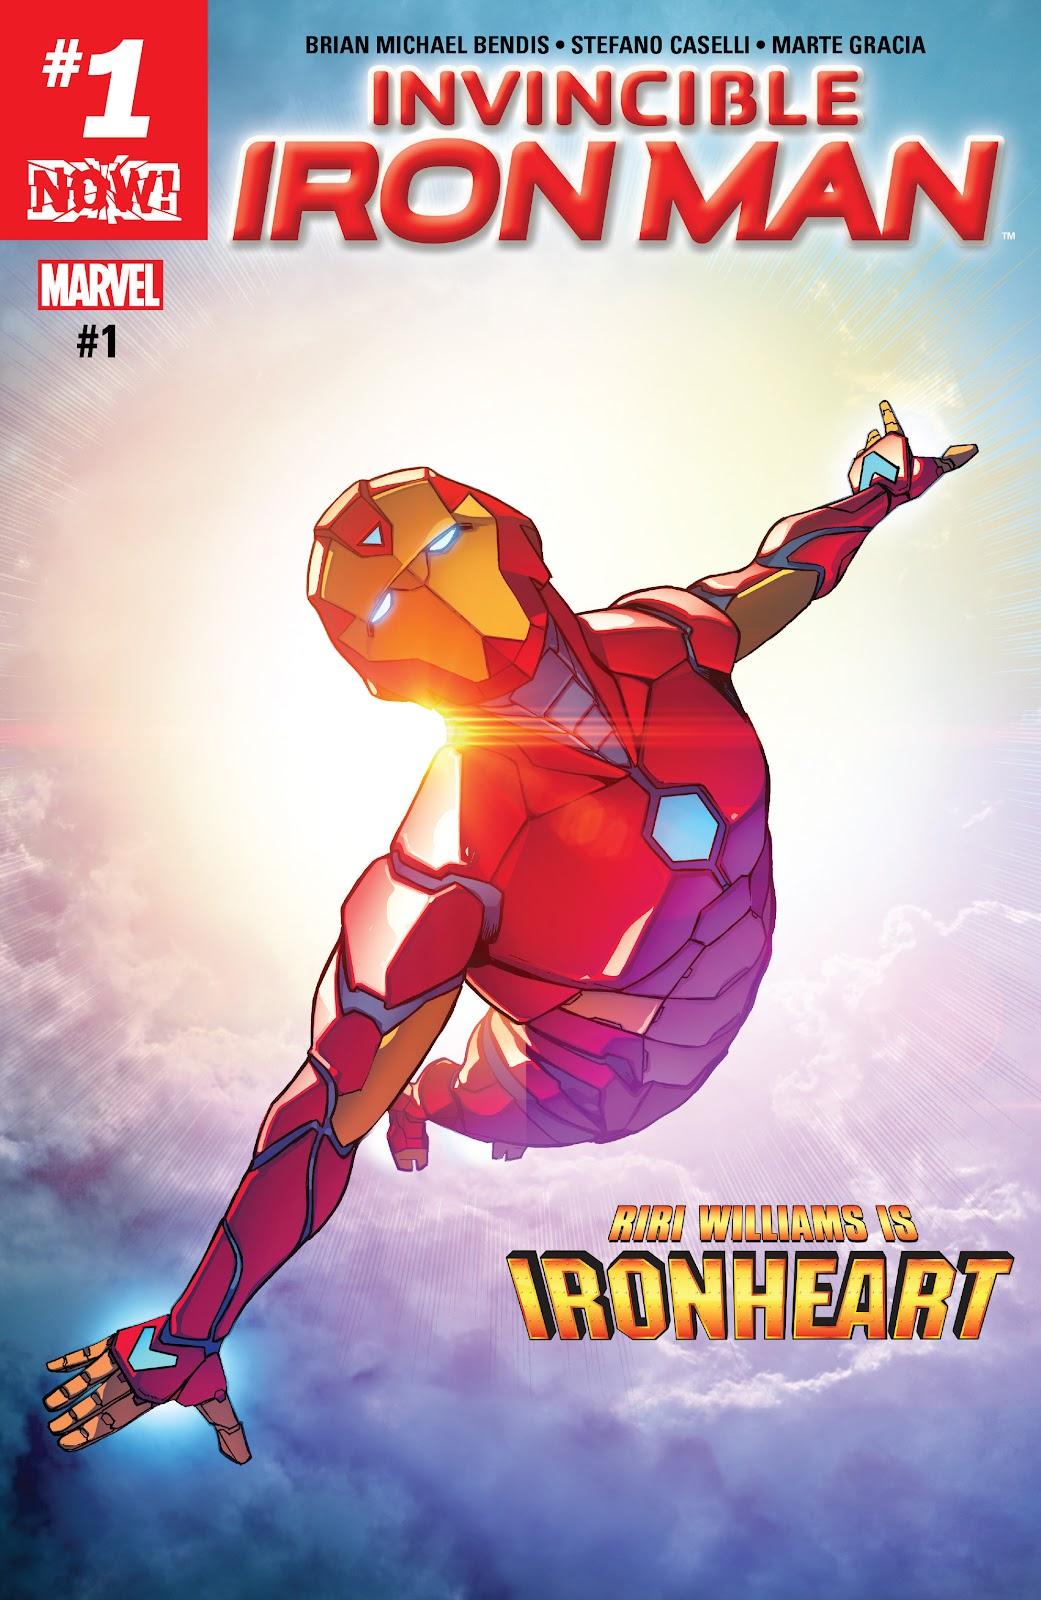 Invincible Iron Man (2016-) 001-000.jpg